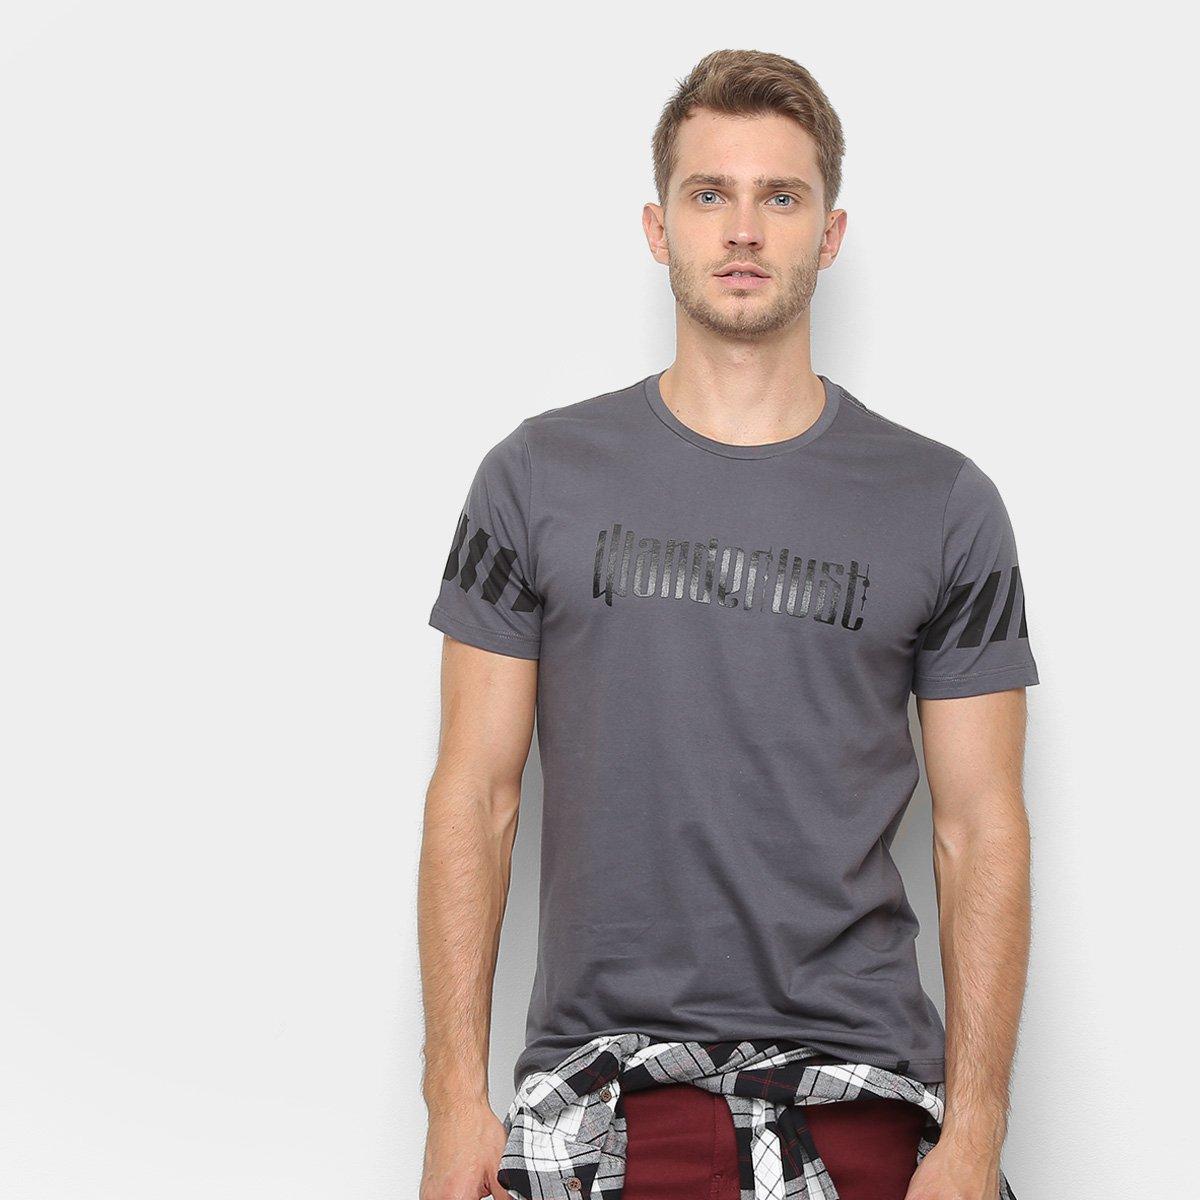 9273f02570 Camiseta All Free Wanderlust Masculina - Cinza - Compre Agora